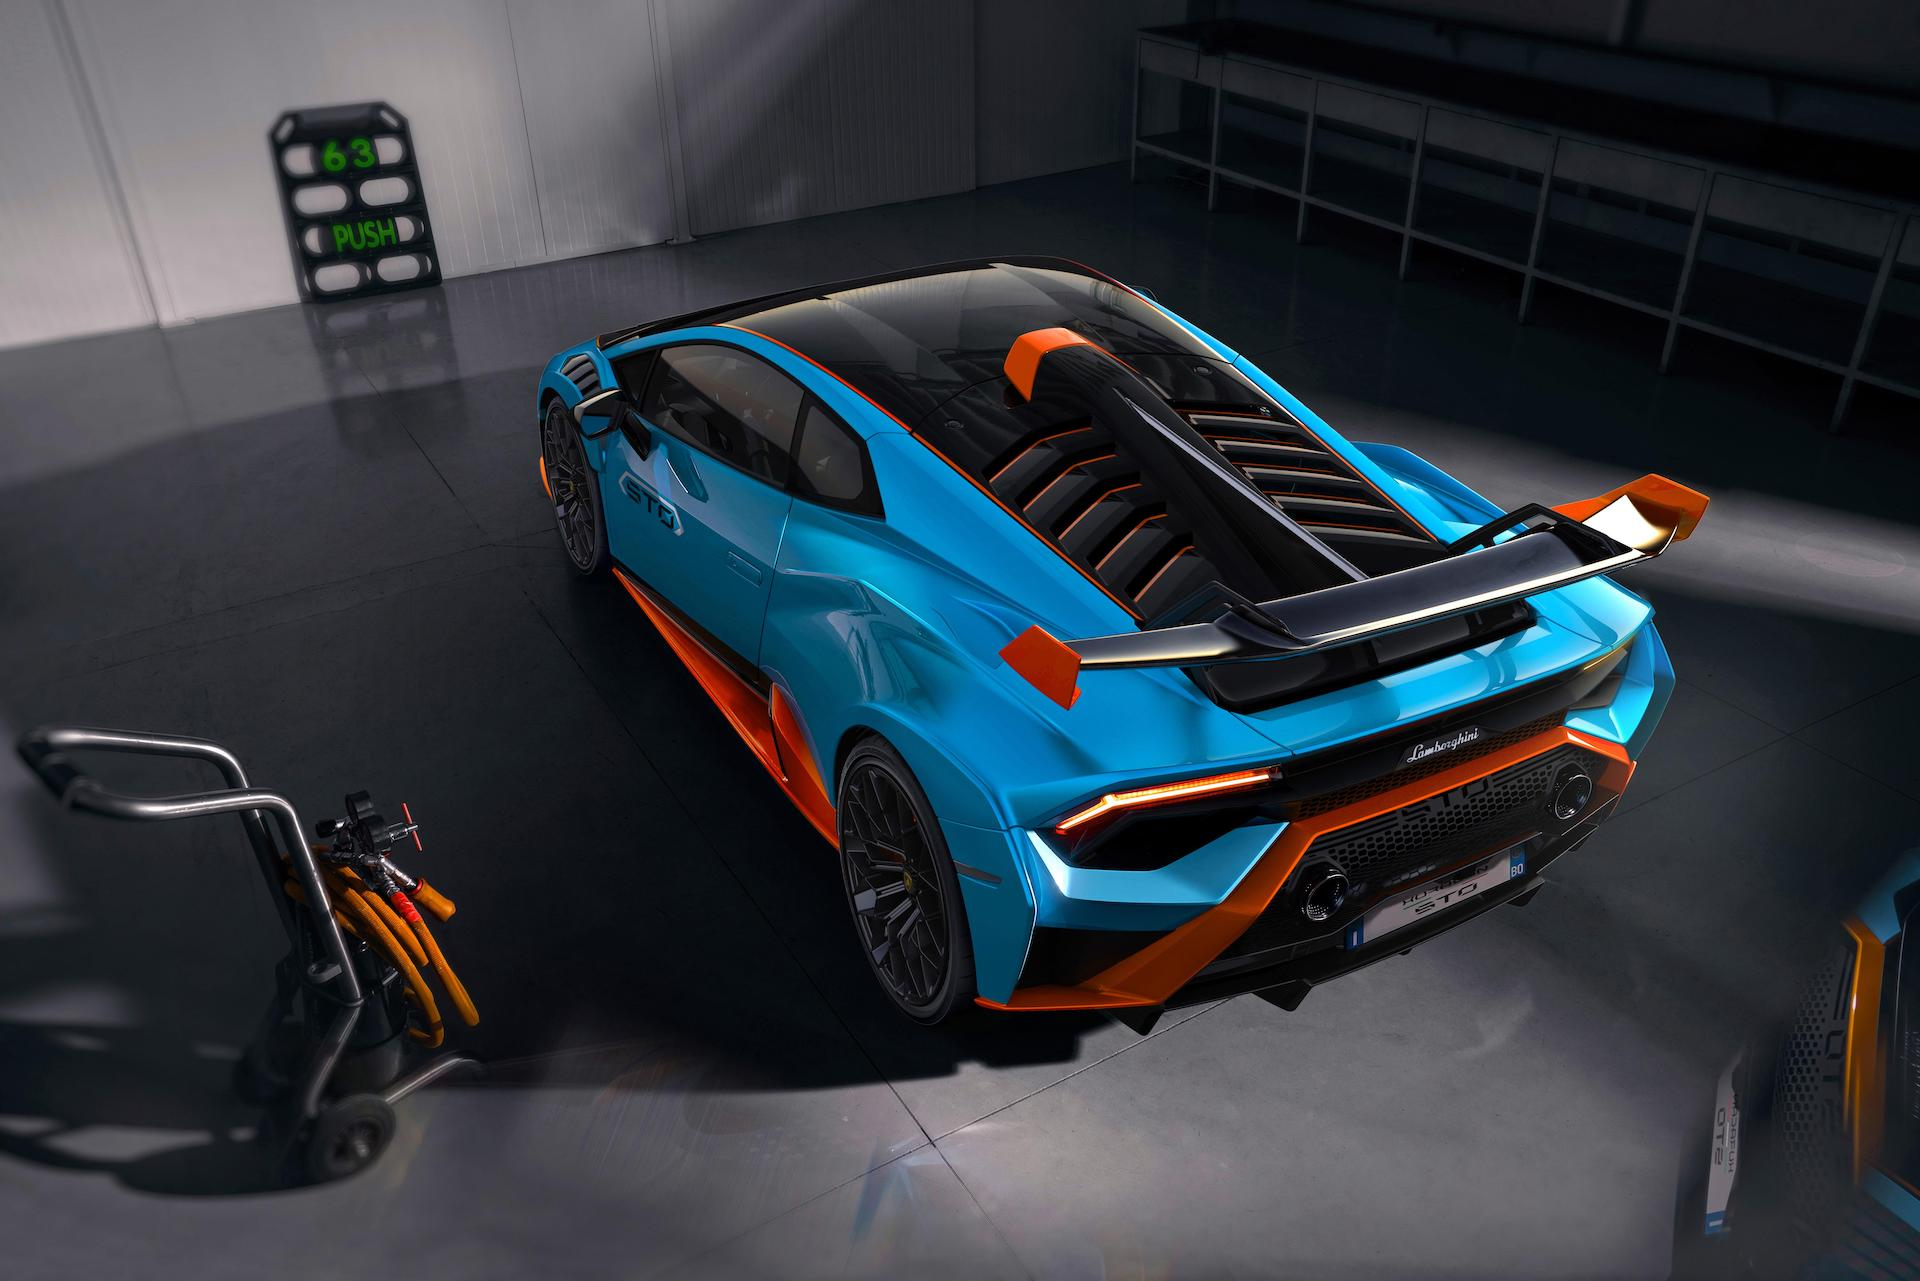 Der neue Lamborghini STO: Die Inkarnation des Squadra Corse-Erbes 5